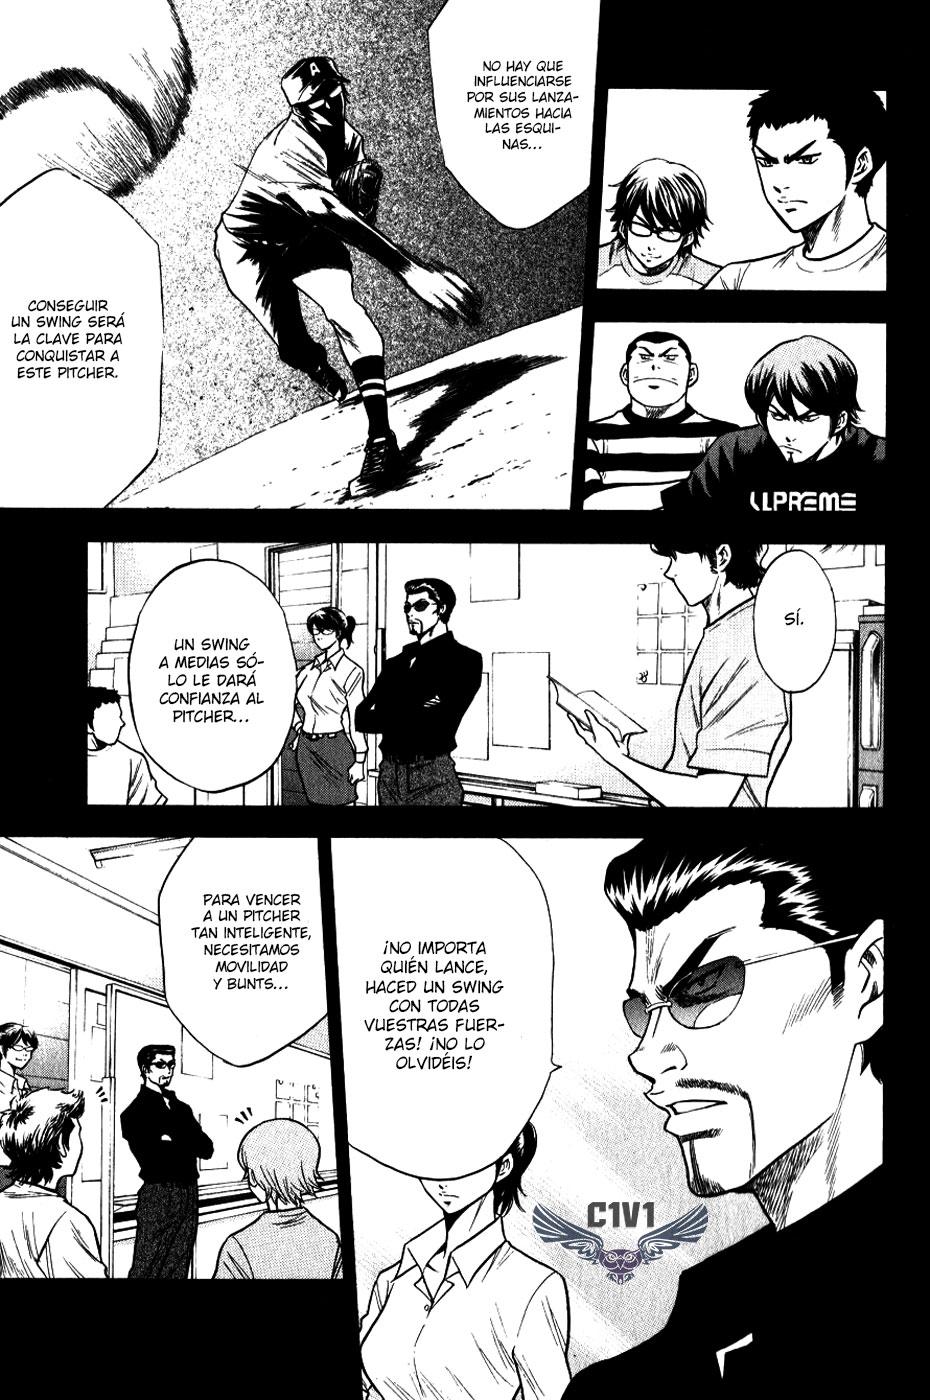 http://c5.ninemanga.com/es_manga/24/1752/391284/6e2253d472803d93d15023a5adacbcc4.jpg Page 8